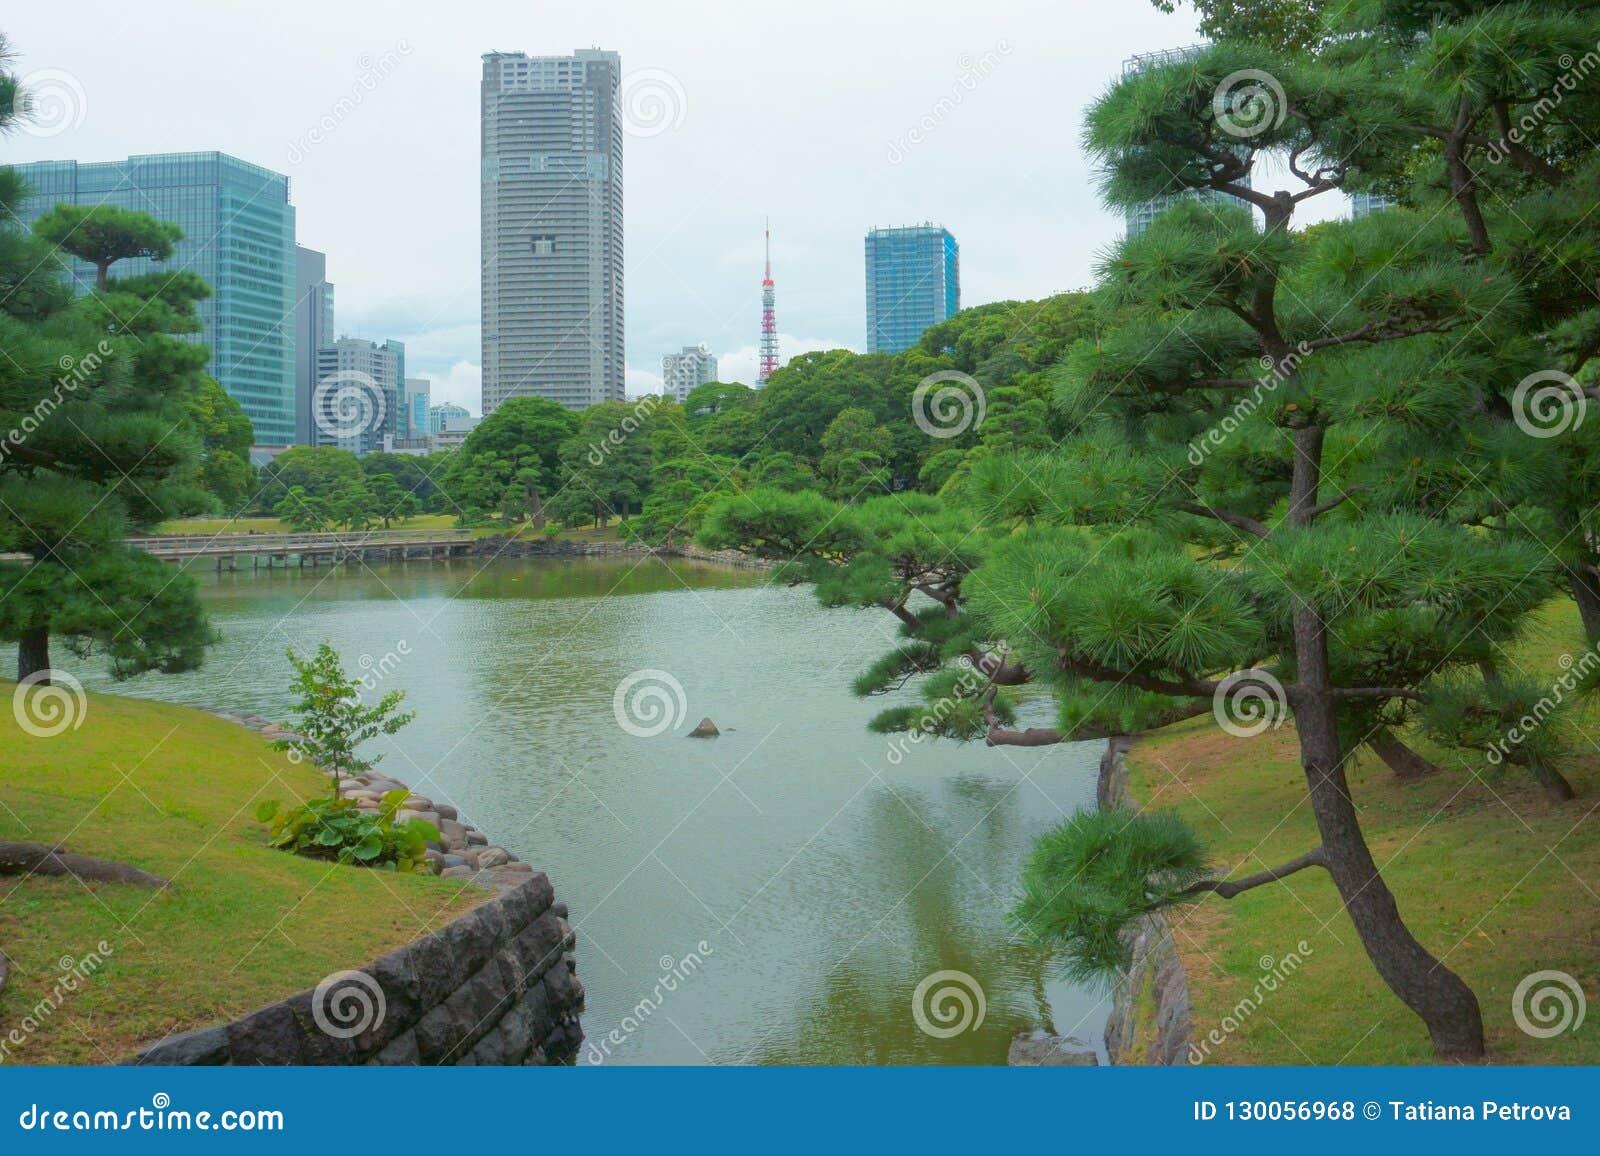 Japanese garden on the background of modern buildings